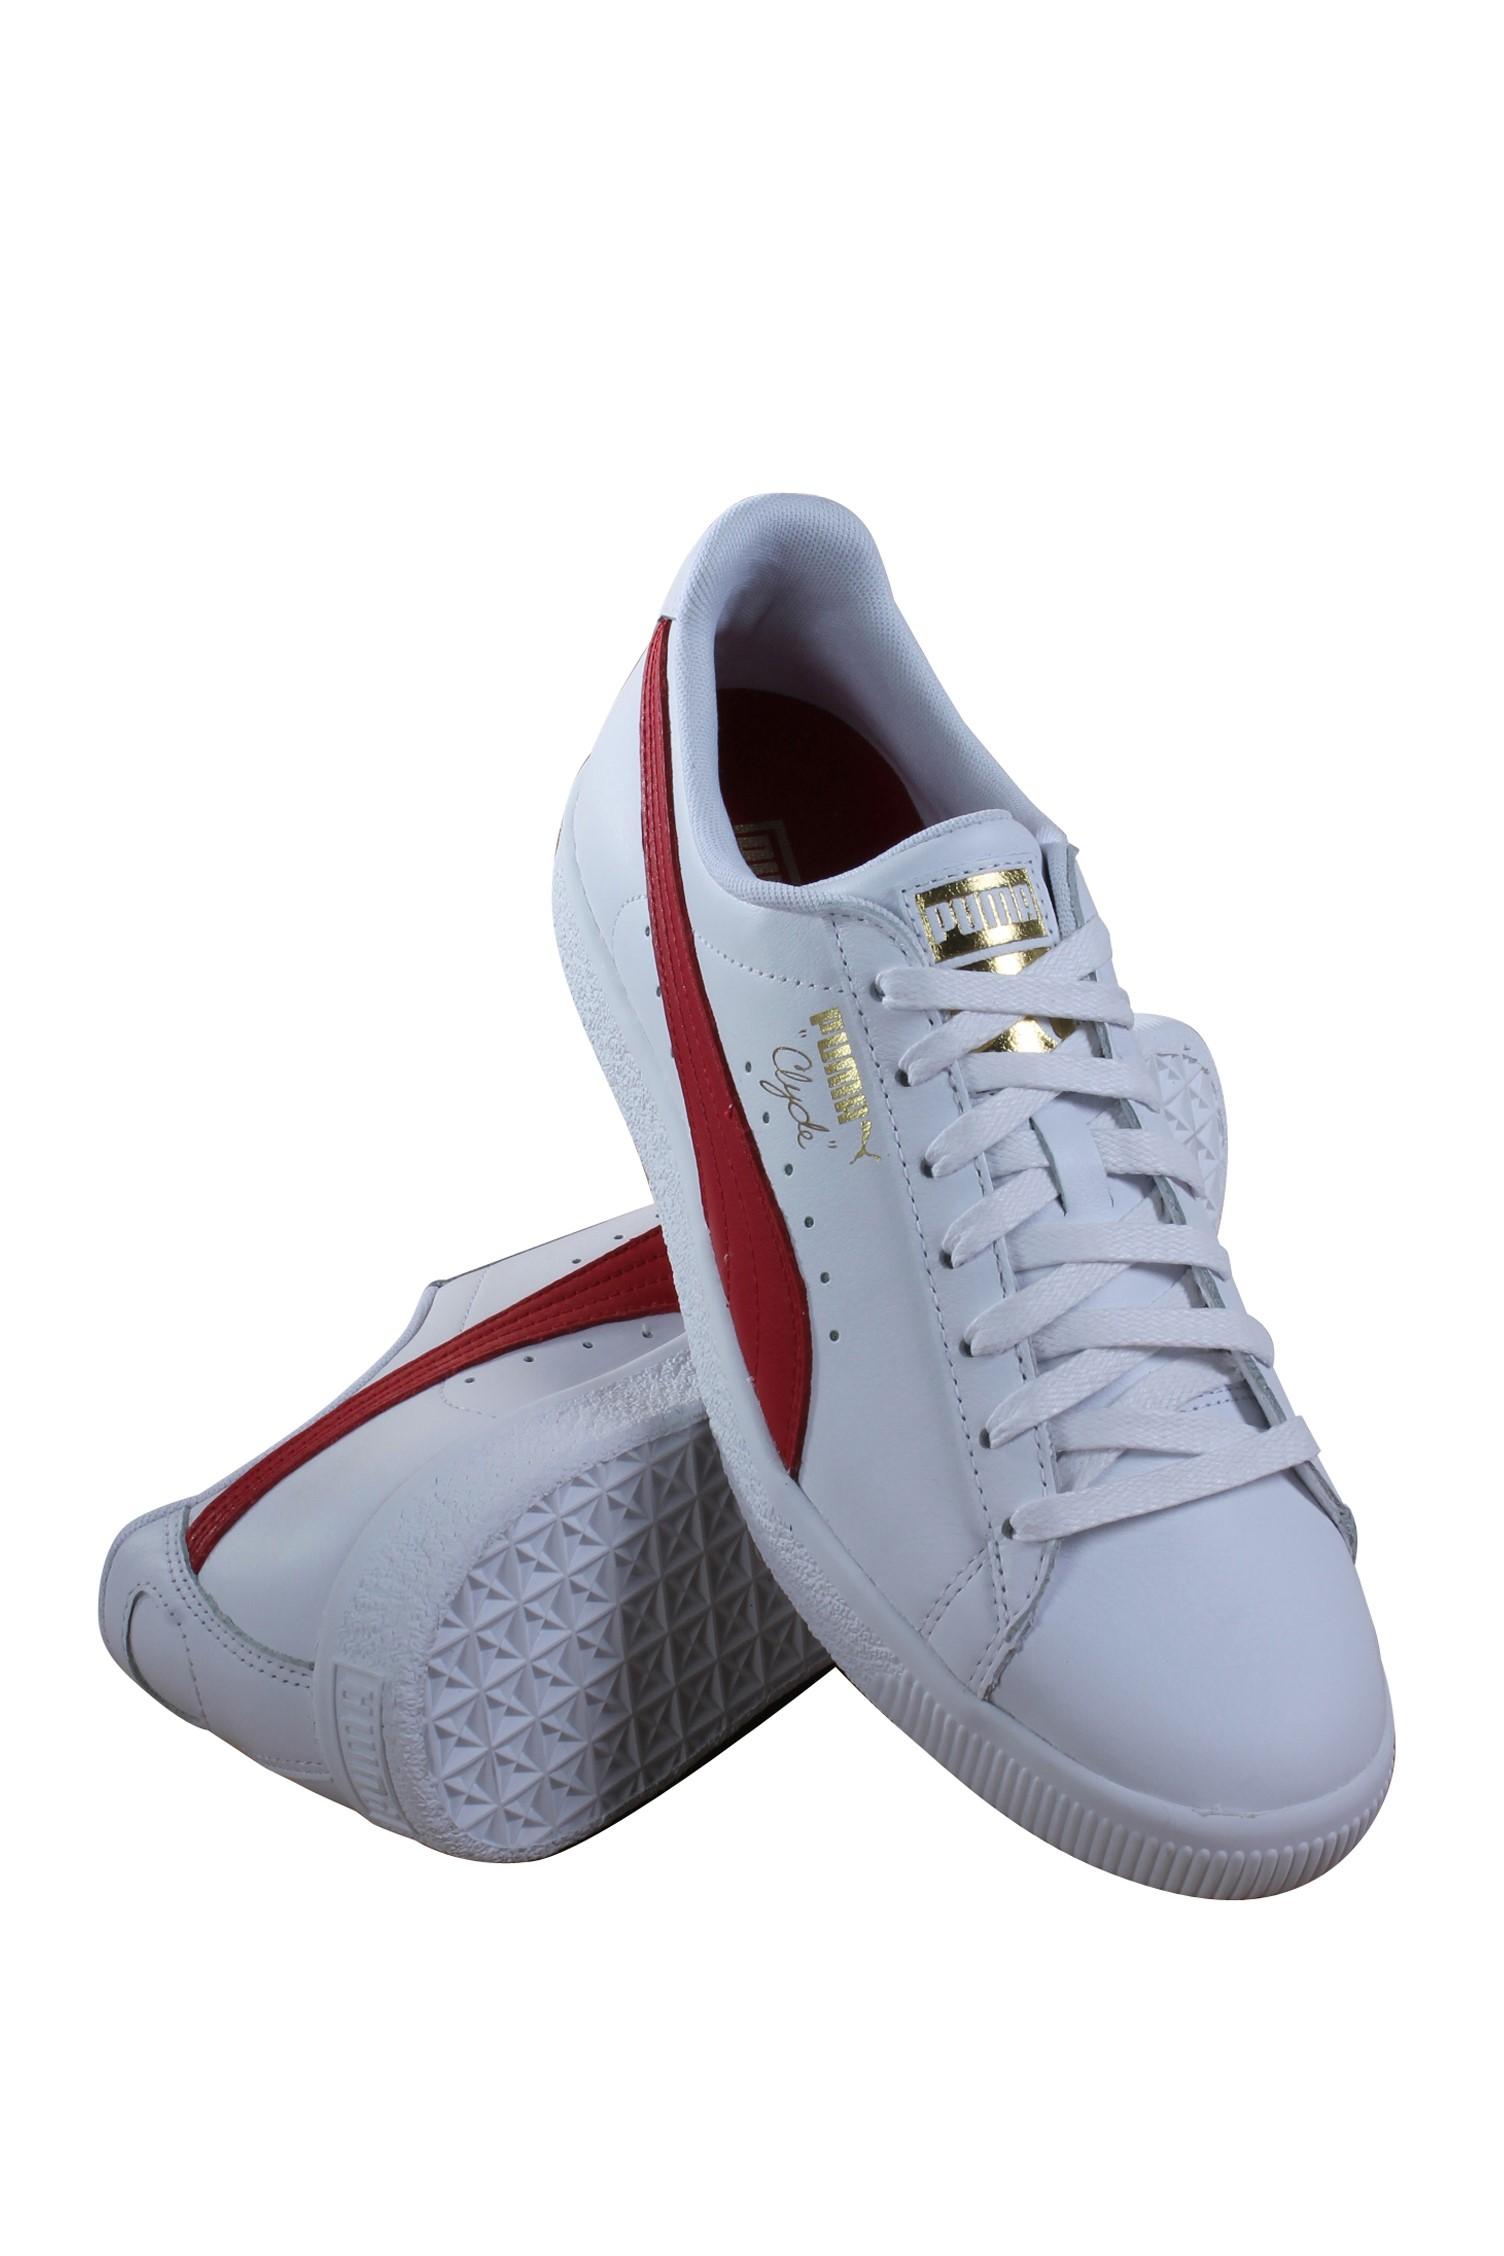 PUMA - Puma Clyde Core L Foil Men s Shoes White-Barbados Cherry-Gold  364669-03 - Walmart.com f74af7c0d